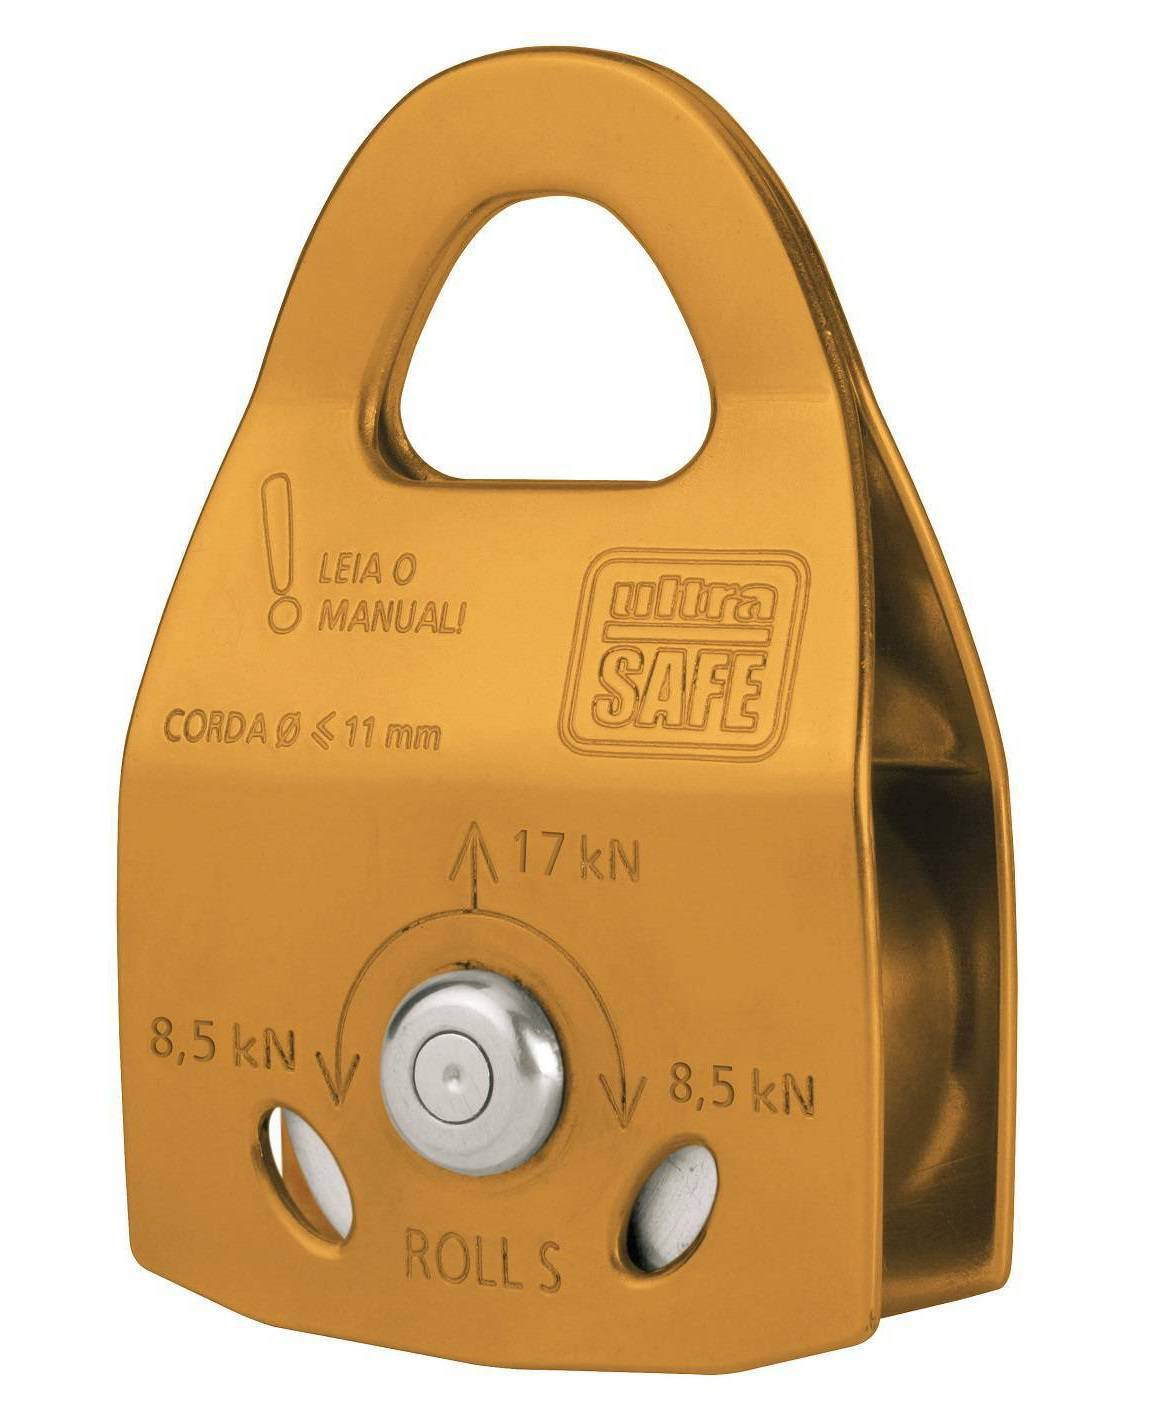 Polia Simples Duraluminio Oscilante 17KN Roll S Ultra Safe